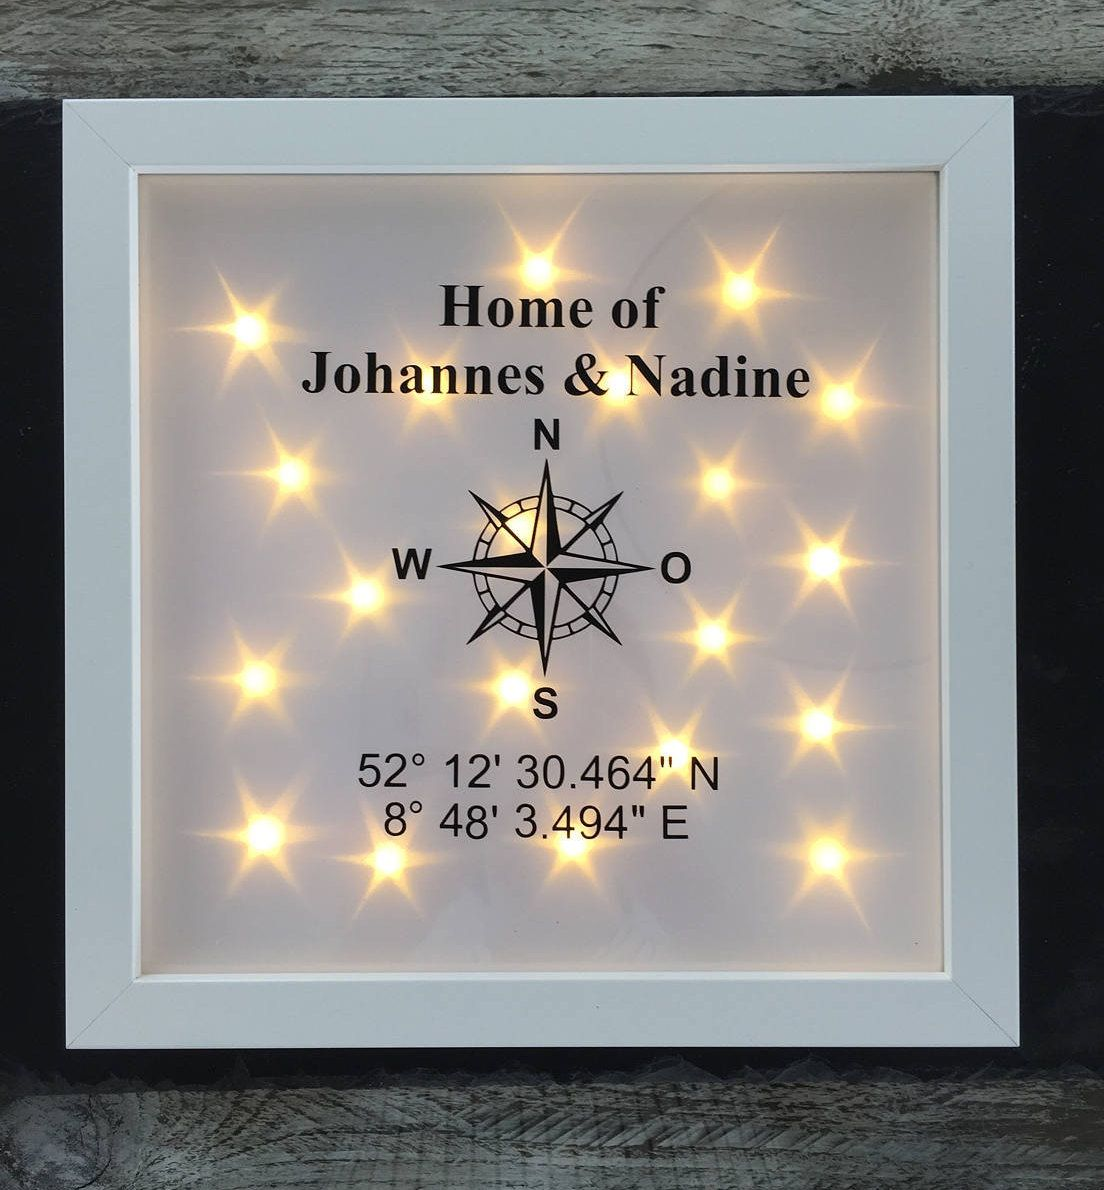 Beleuchteter Bilderrahmen Kompass Koordinaten und Name